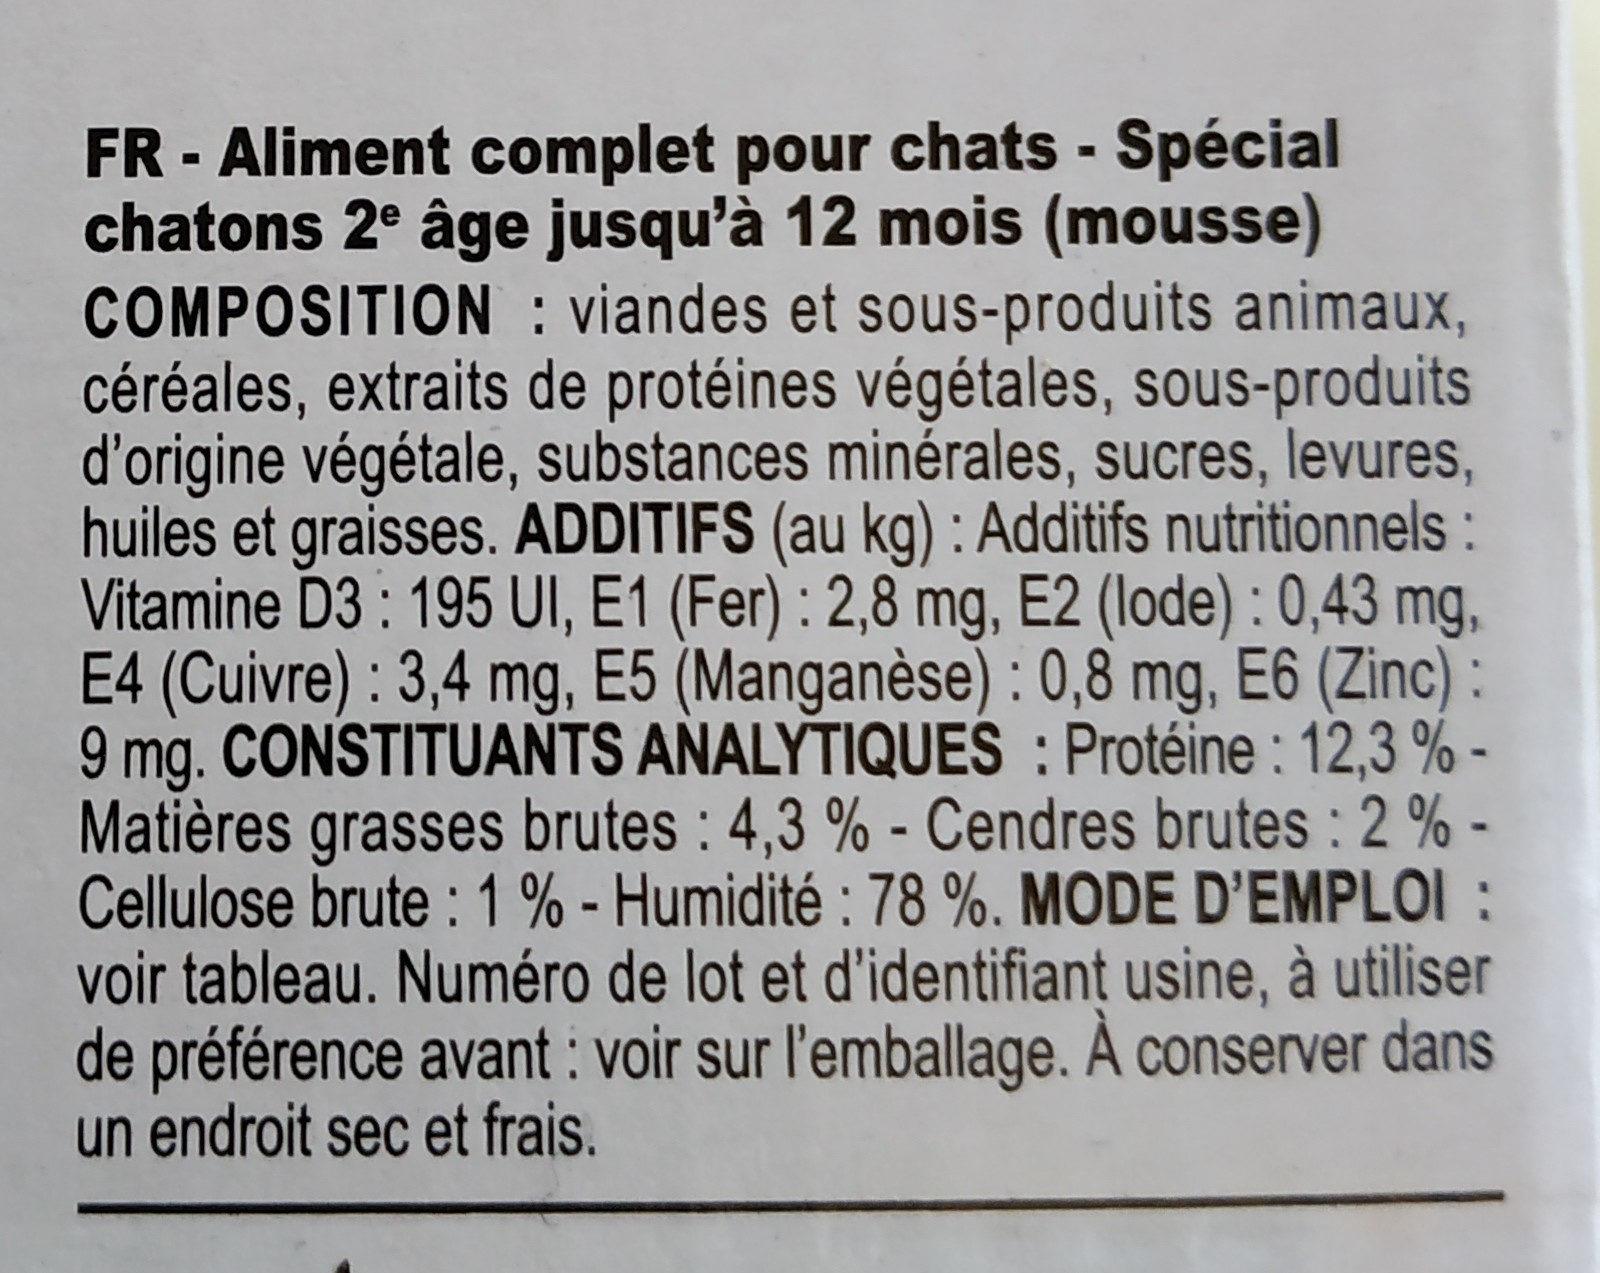 royal canin kitten mousse - Ingredients - fr